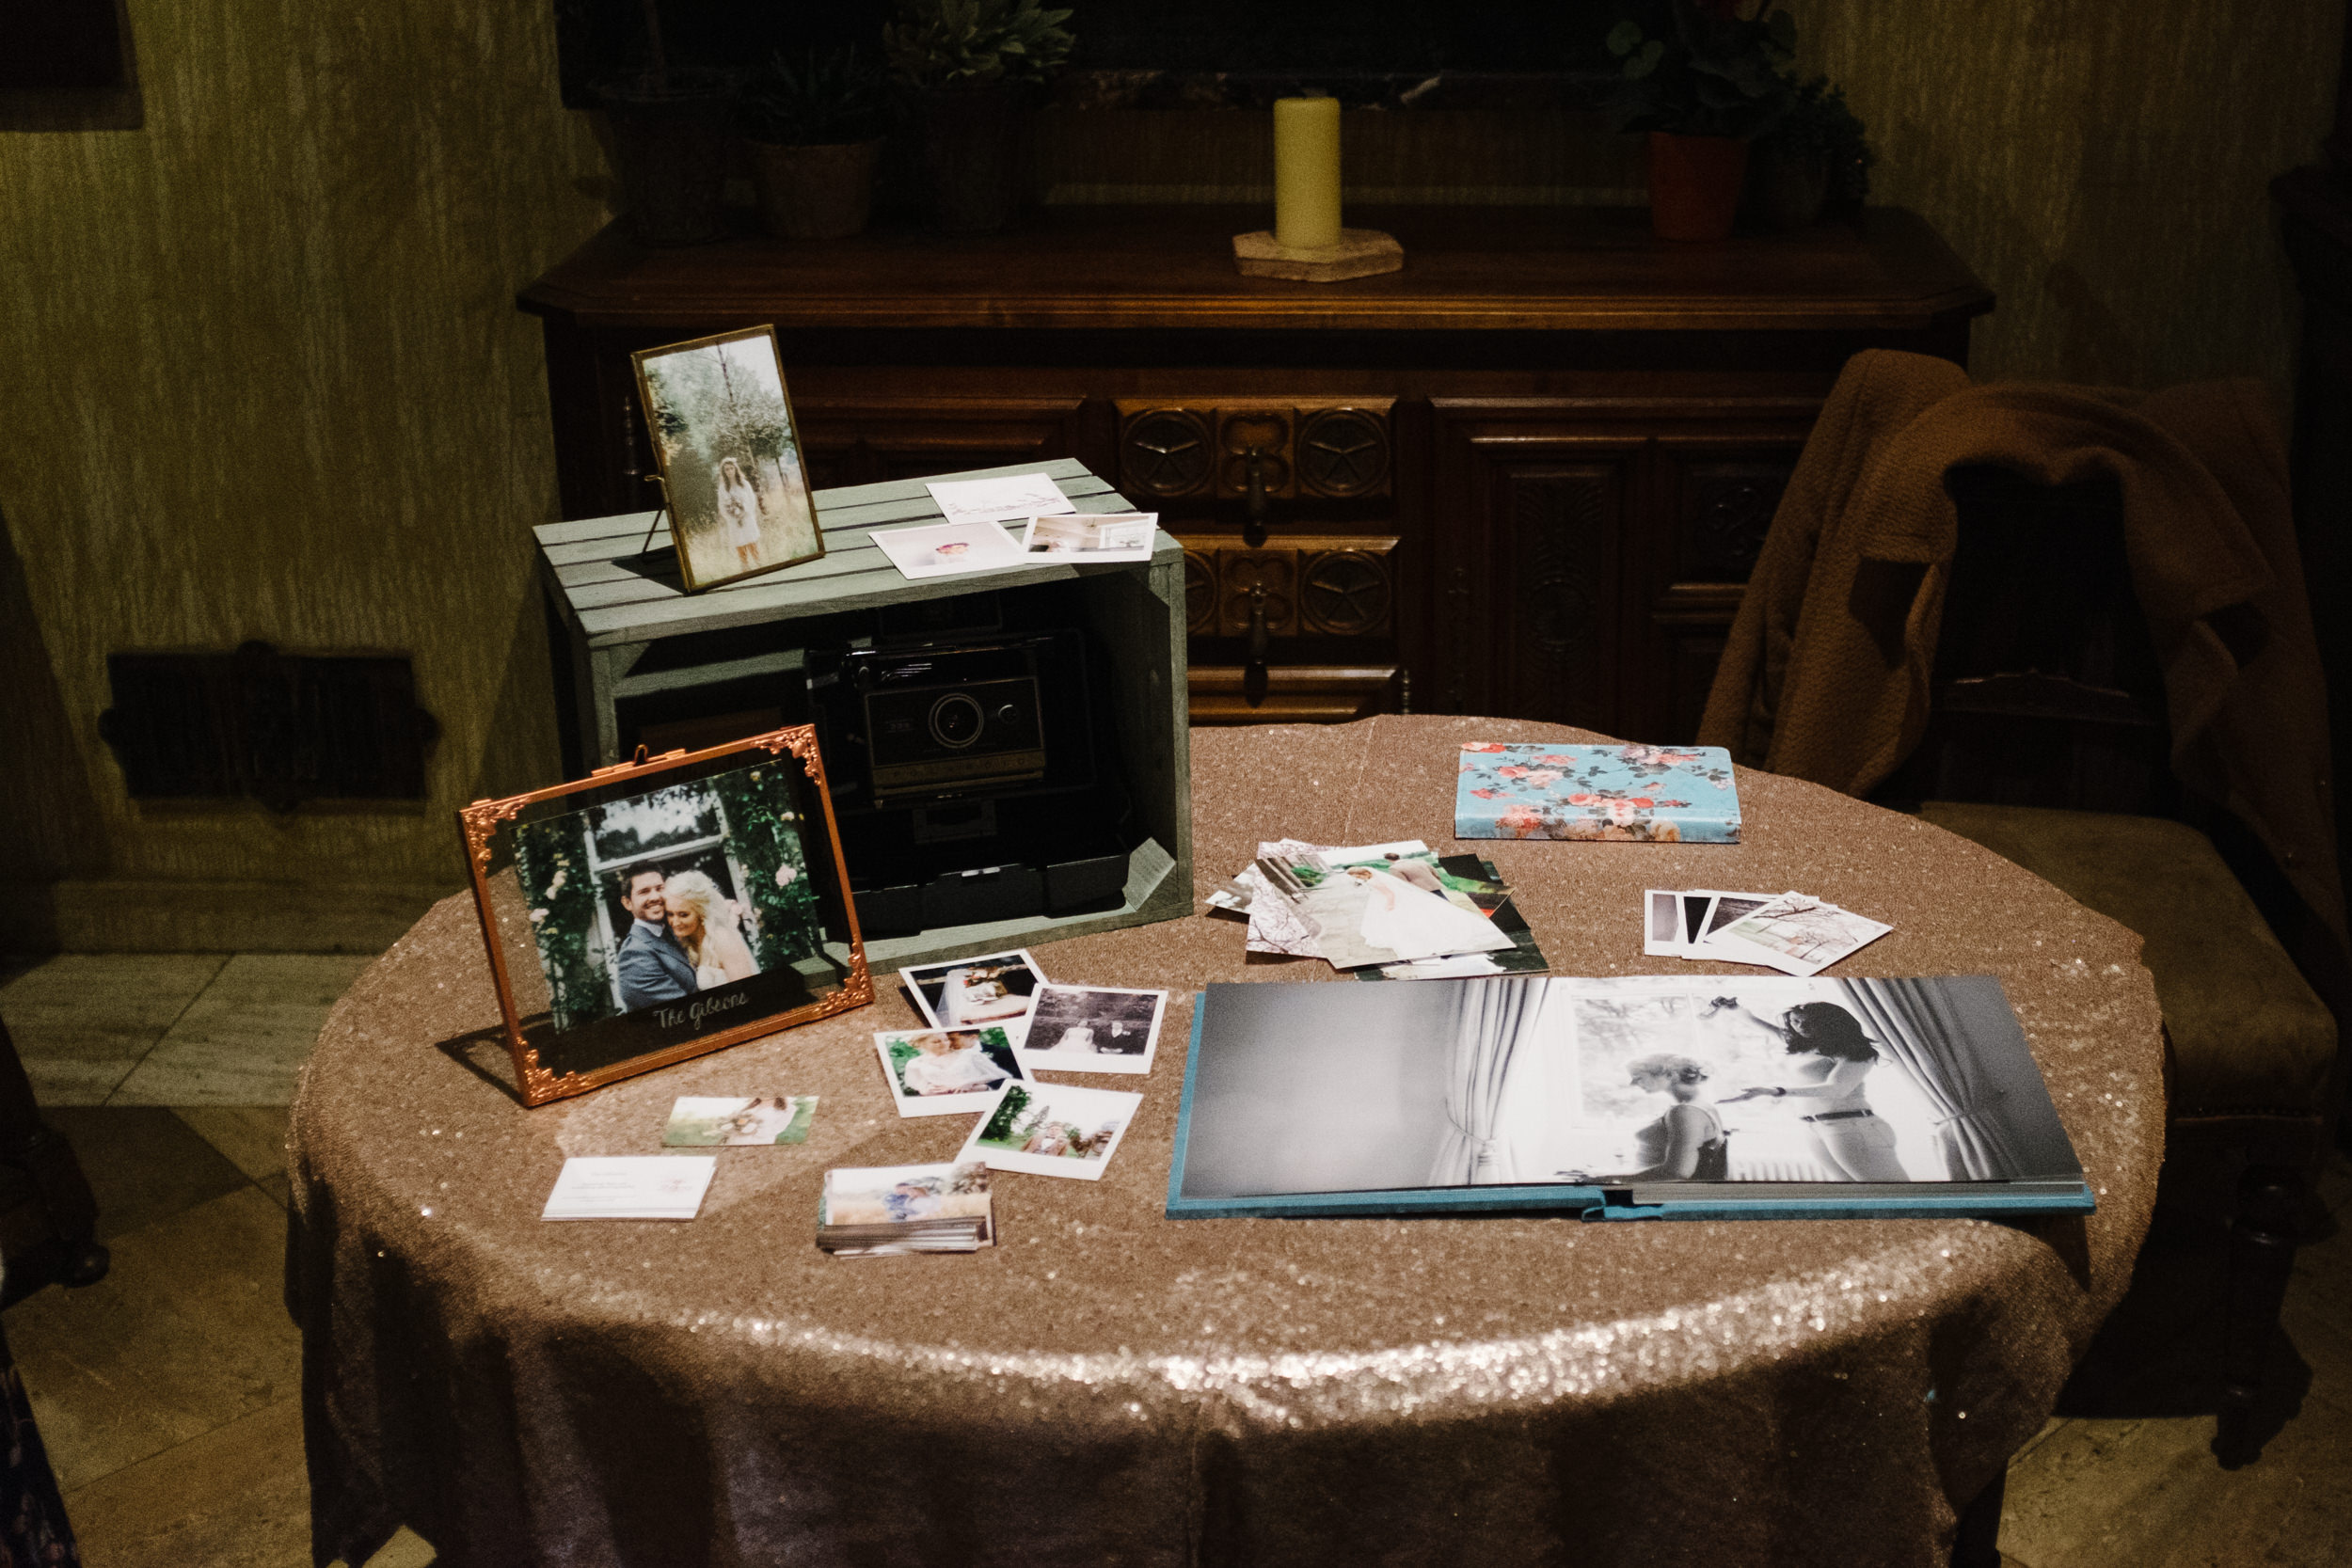 event-promotion-glasgow-agency-walnut-wasp-arta-braw-brides-wedding-workshop-4.jpg